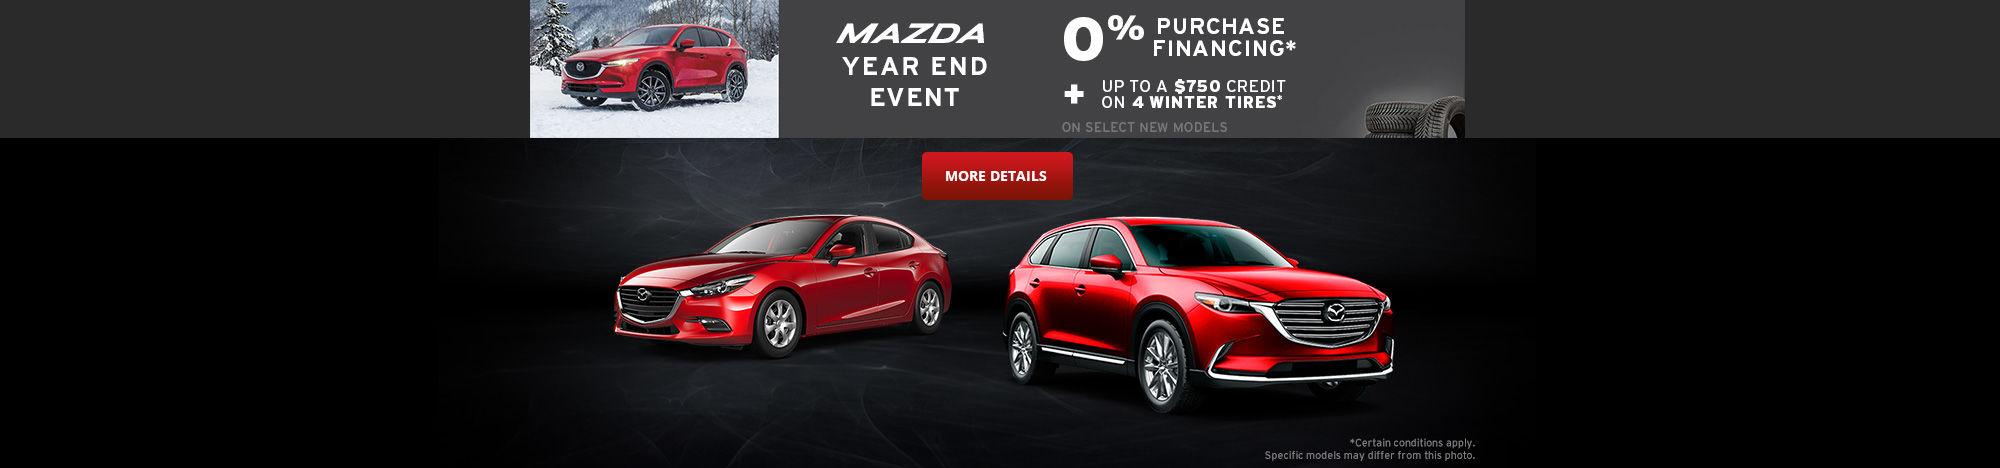 Mazda Event - black friday